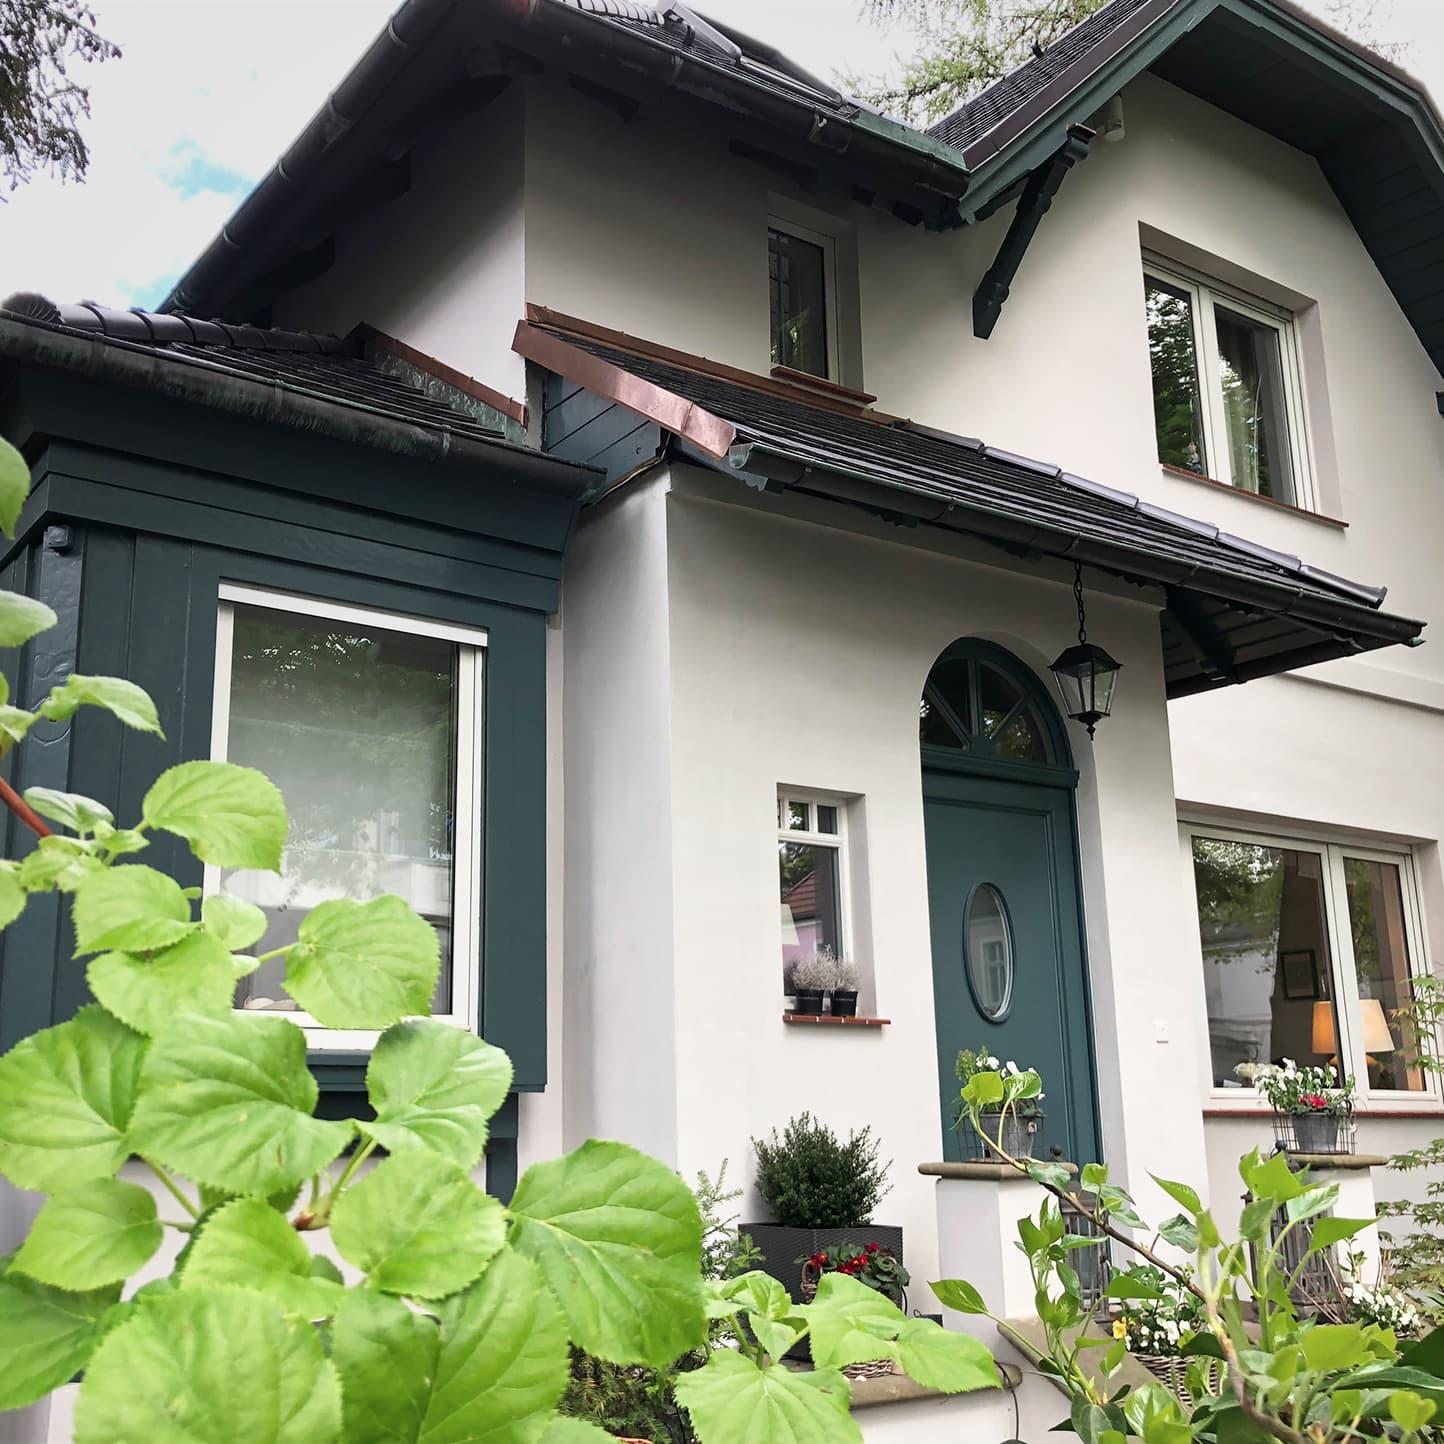 Immobilien verkaufen oder vermieten - All Senses Immobilienagentur Berlin